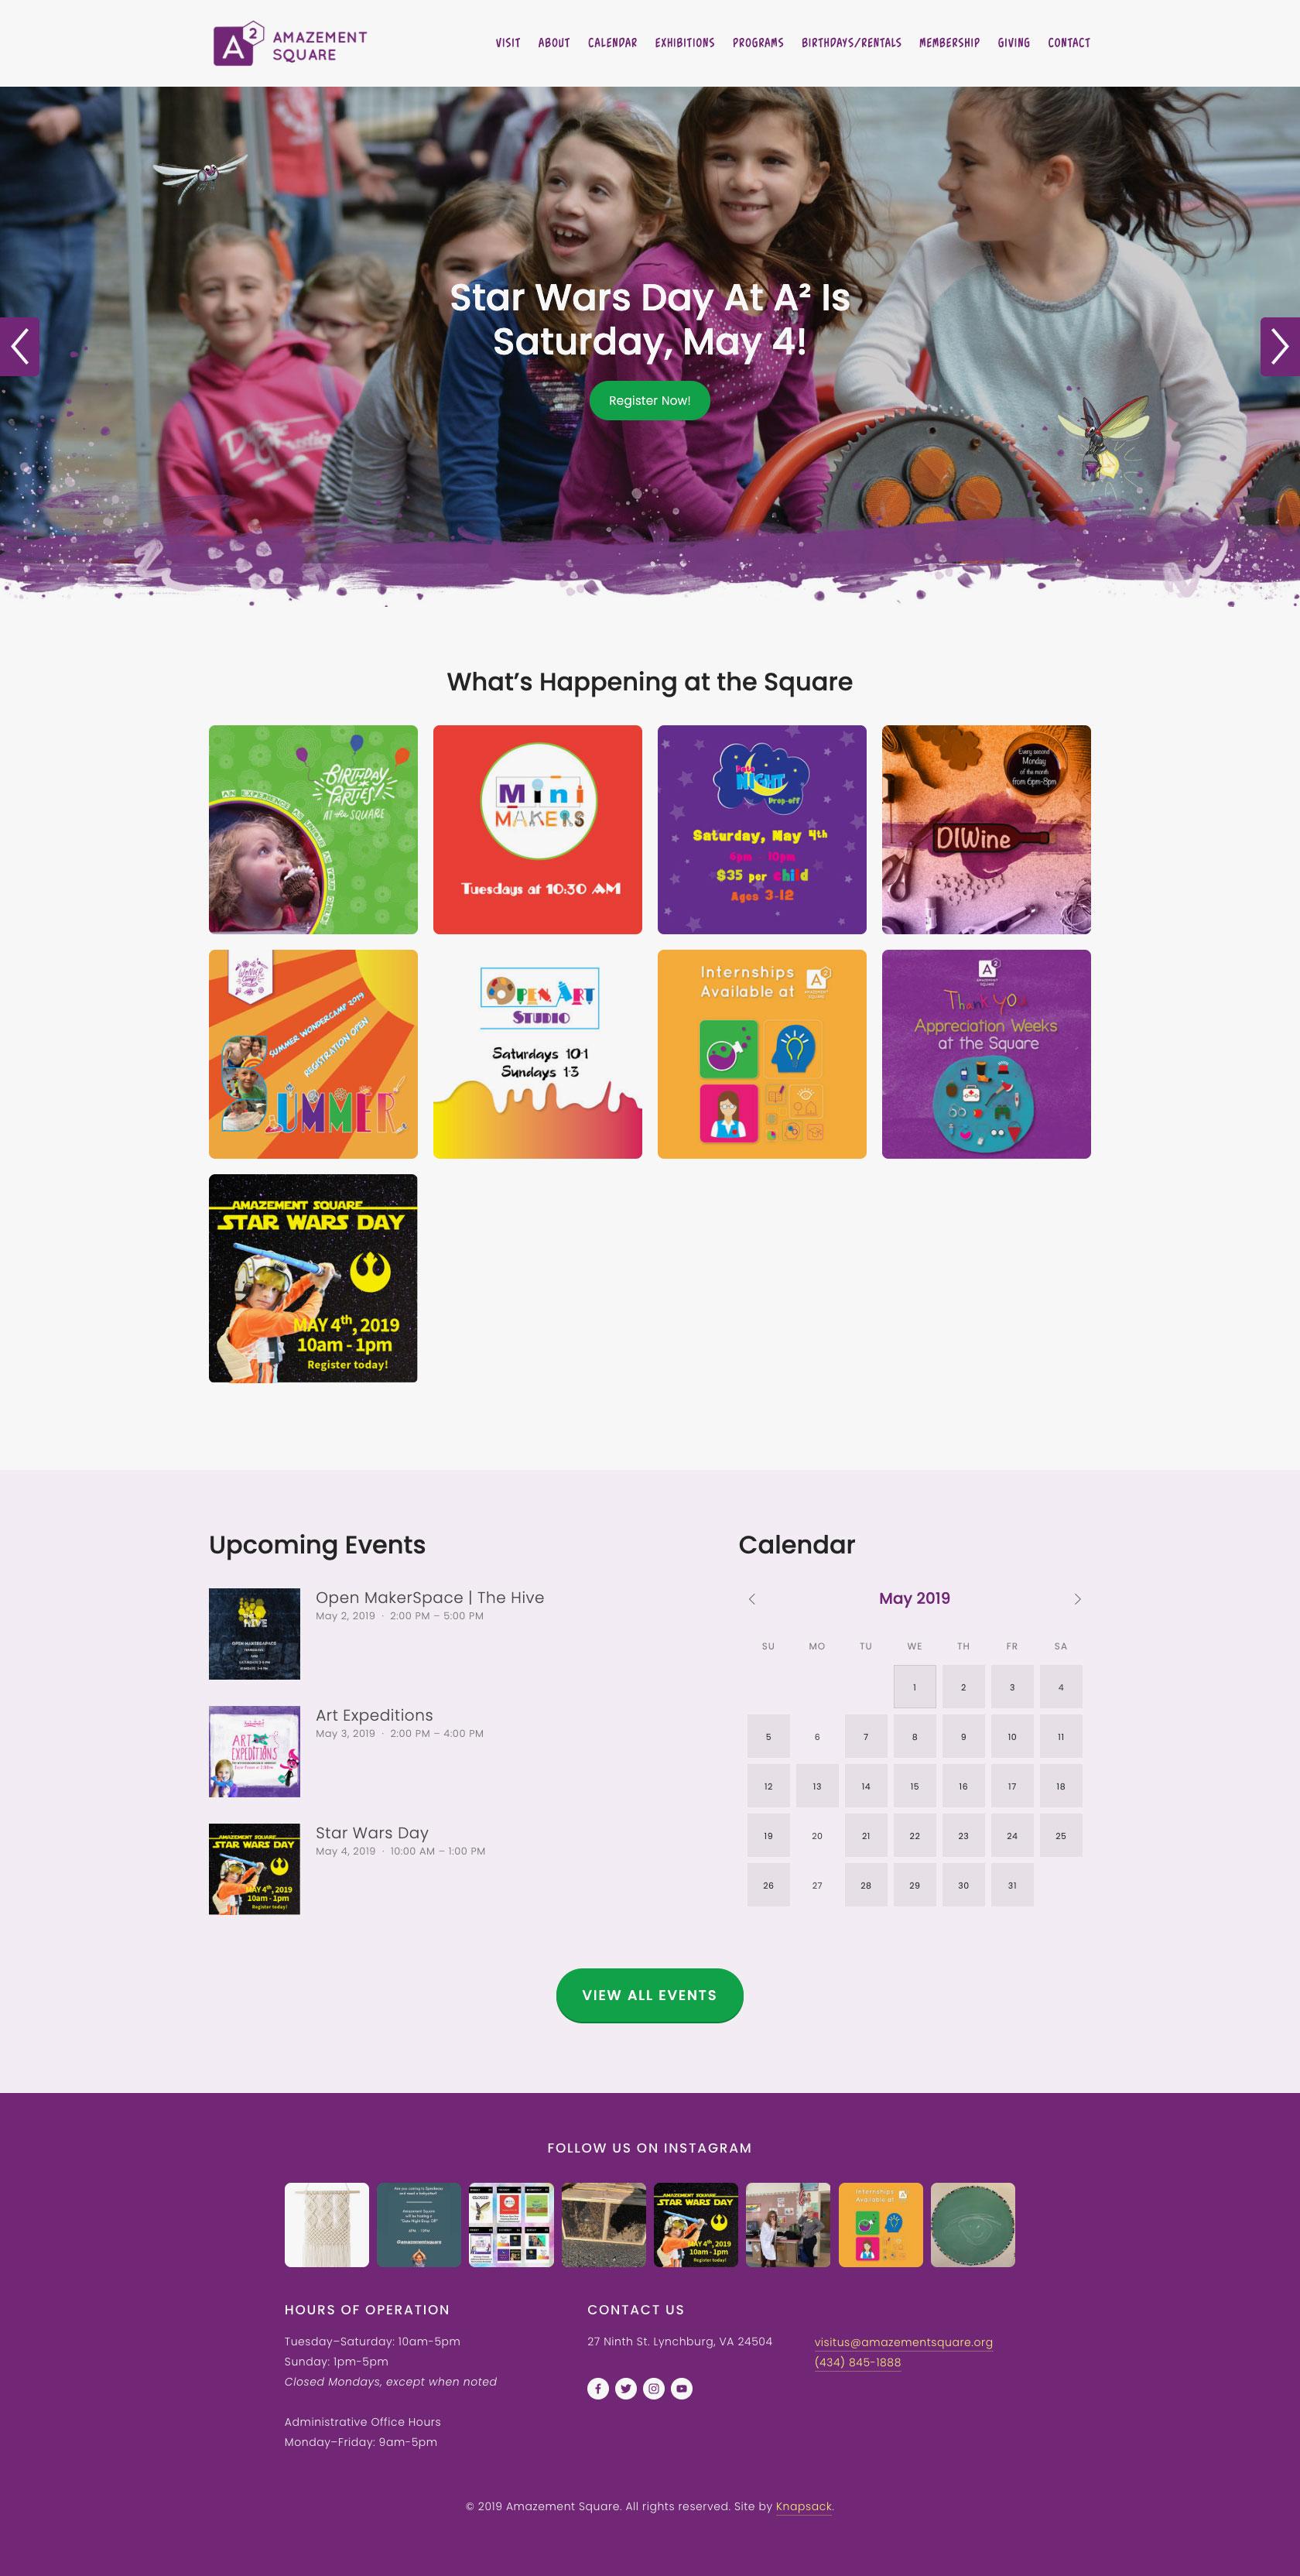 AmazementSquare-home-mac-overlay.jpg